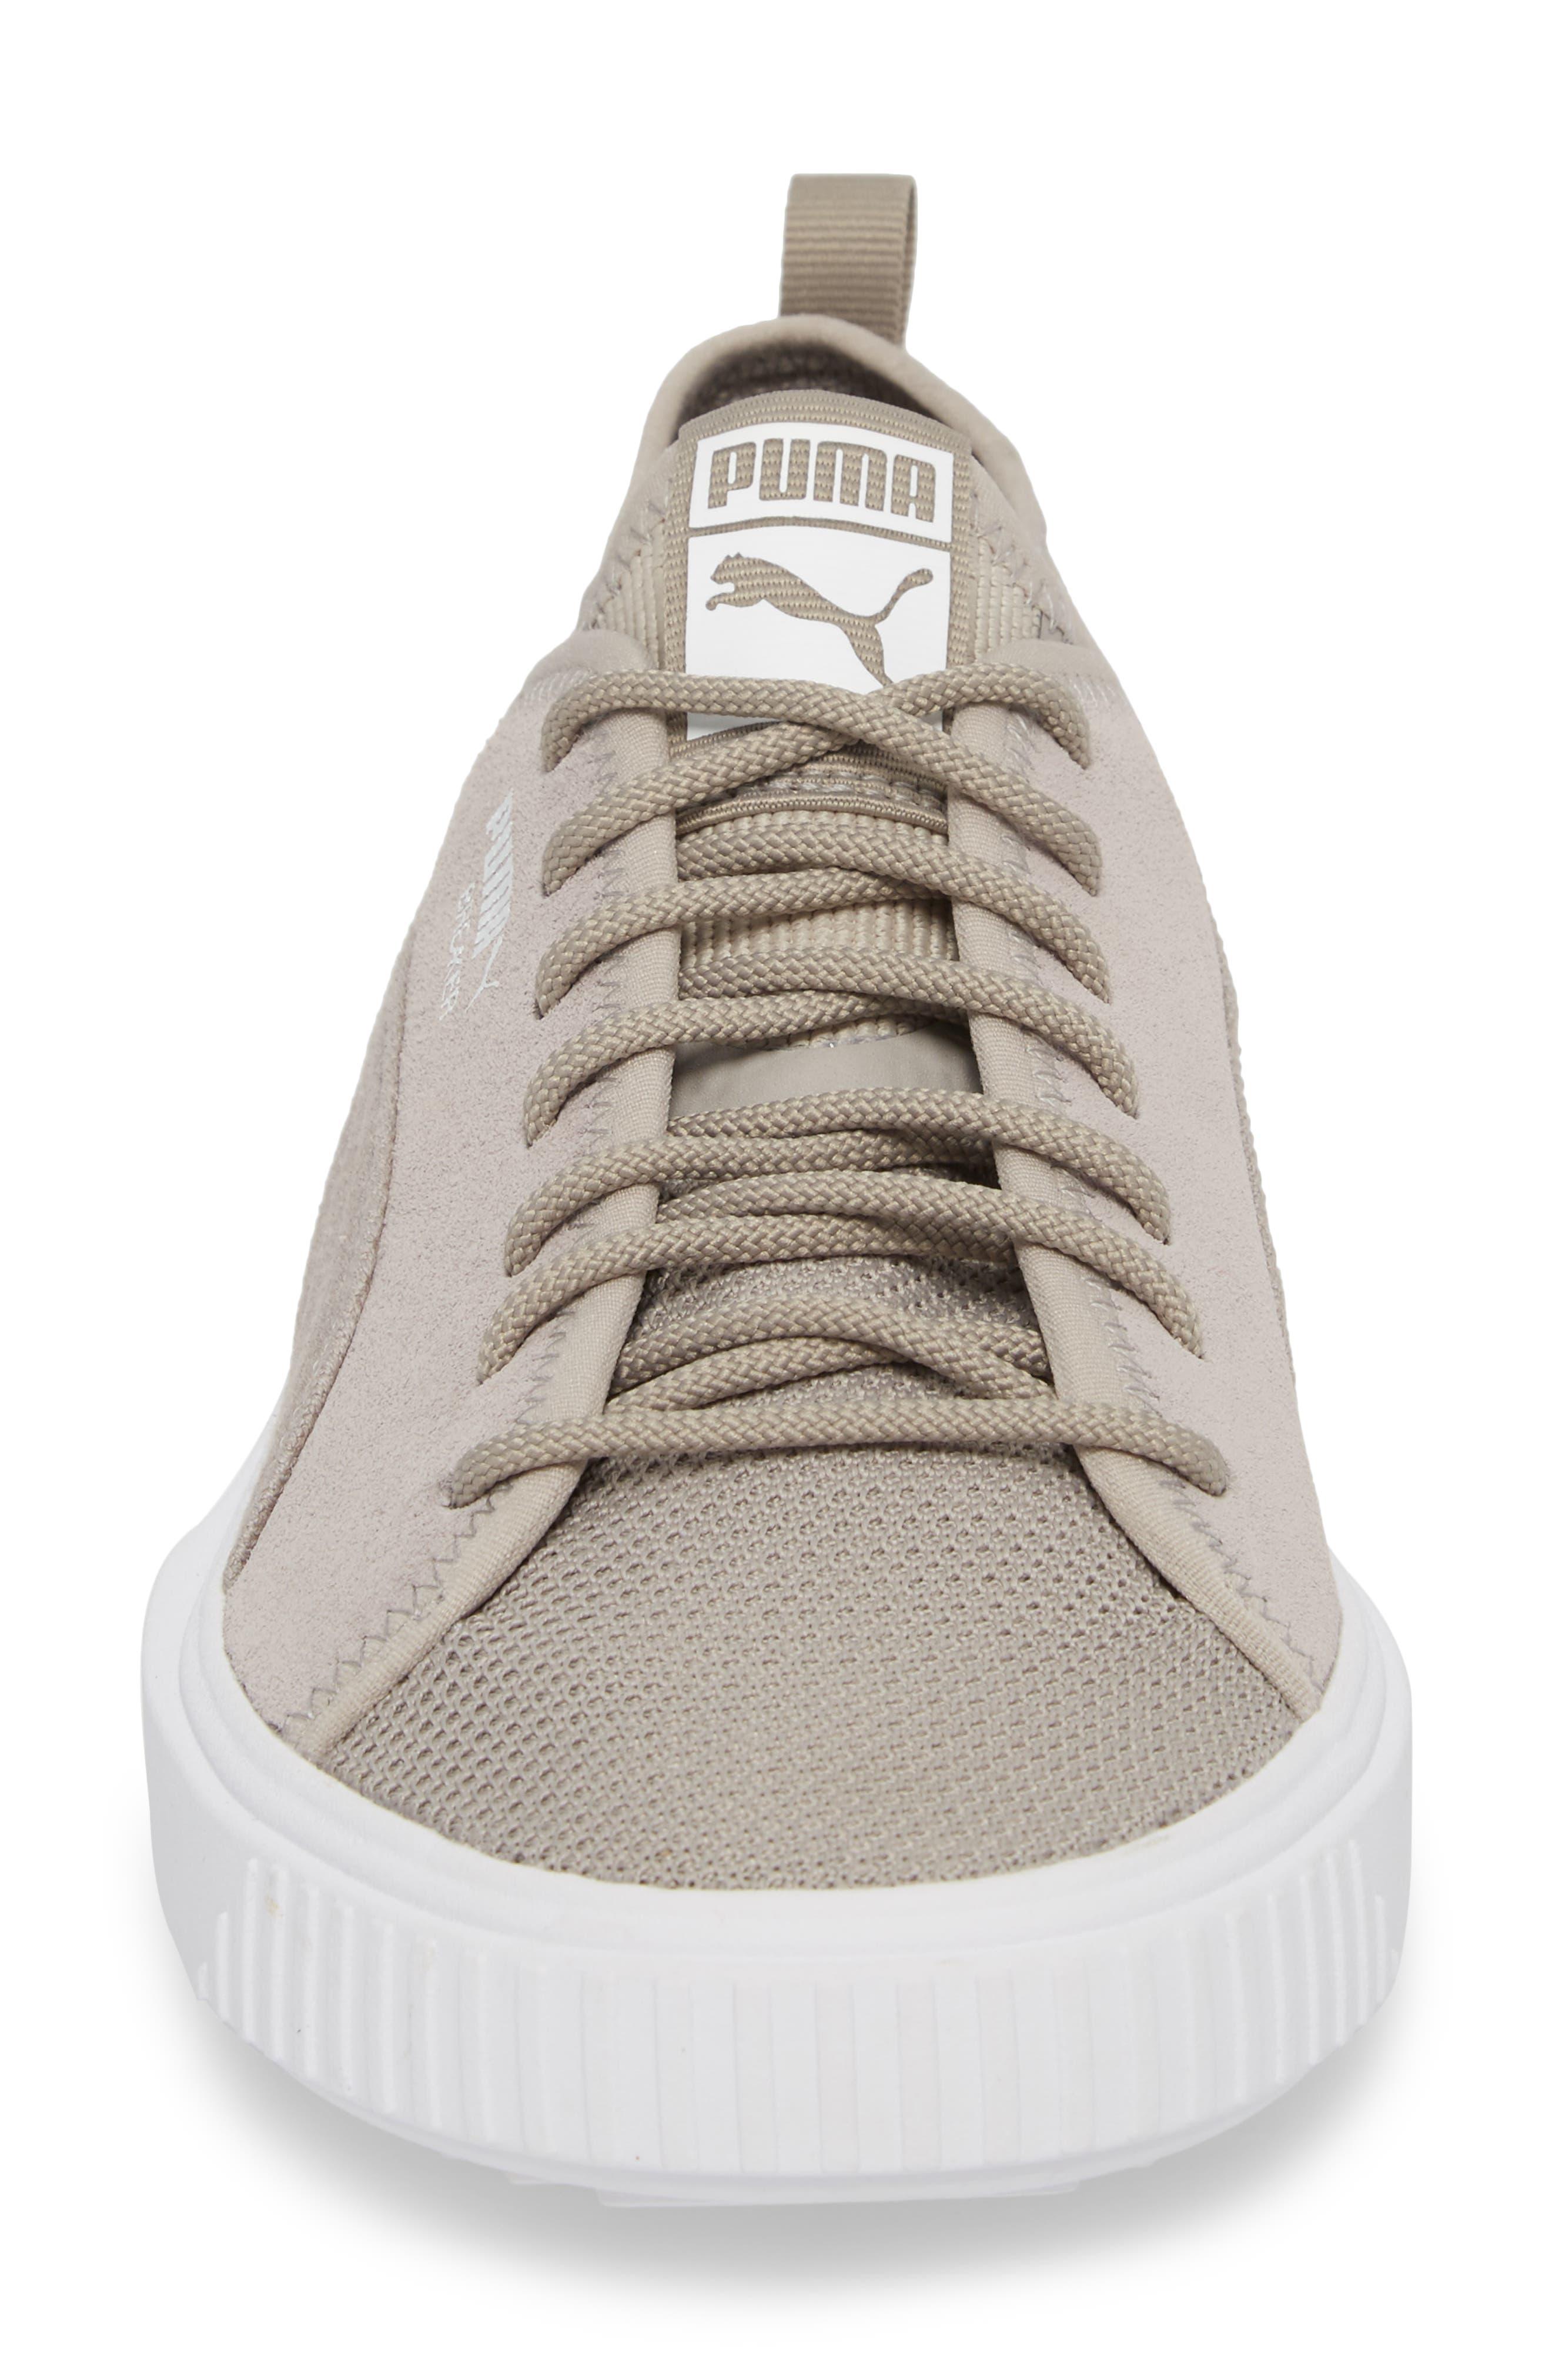 Breaker Mesh Sneaker,                             Alternate thumbnail 4, color,                             Ash/ White Suede